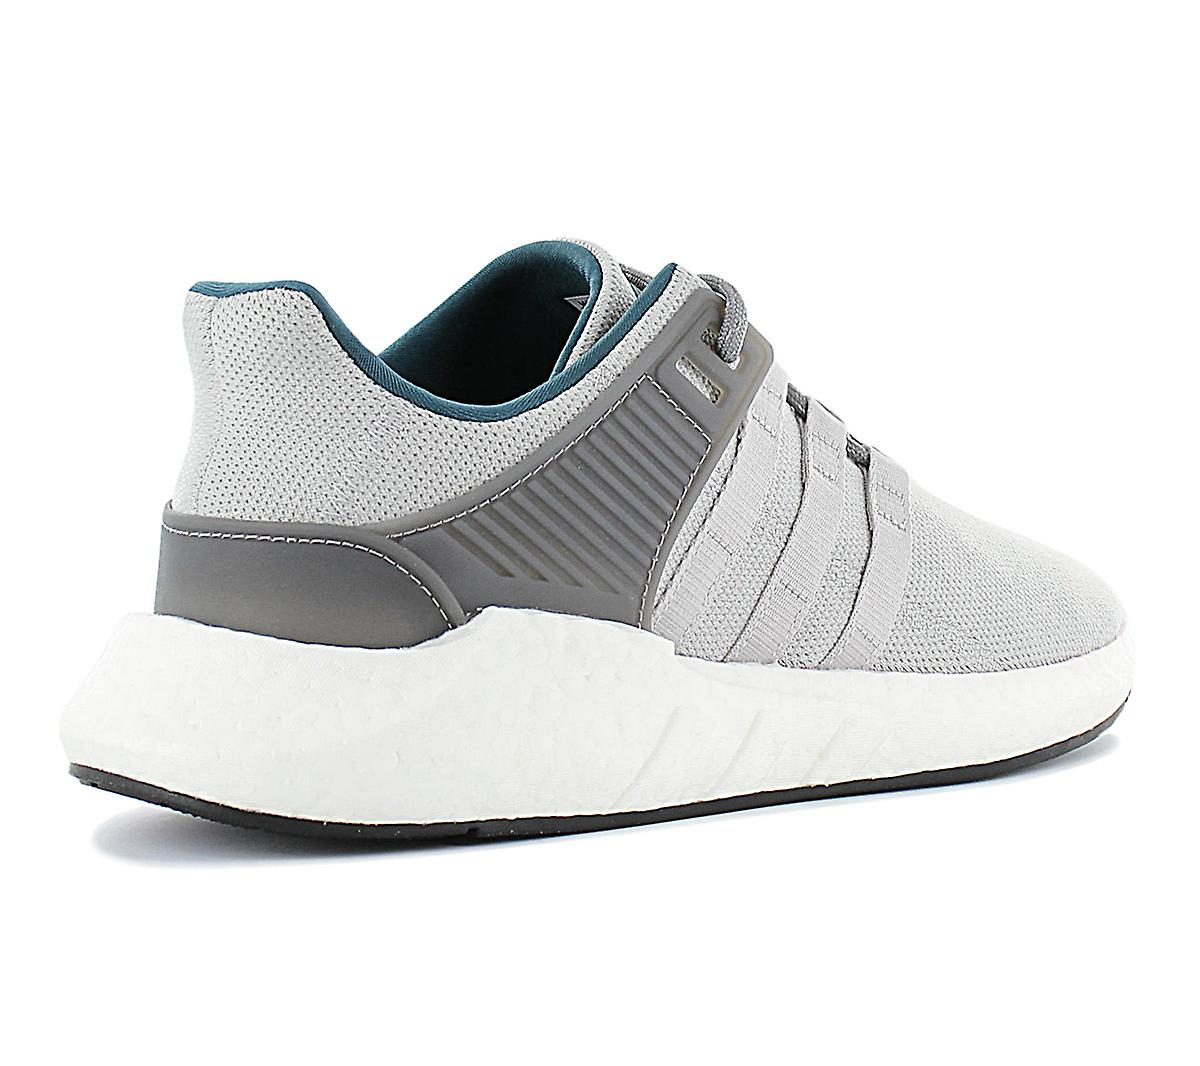 adidas EQT Support 93/17 CQ2395 Herren Schuhe Grau Sneakers Sportschuhe